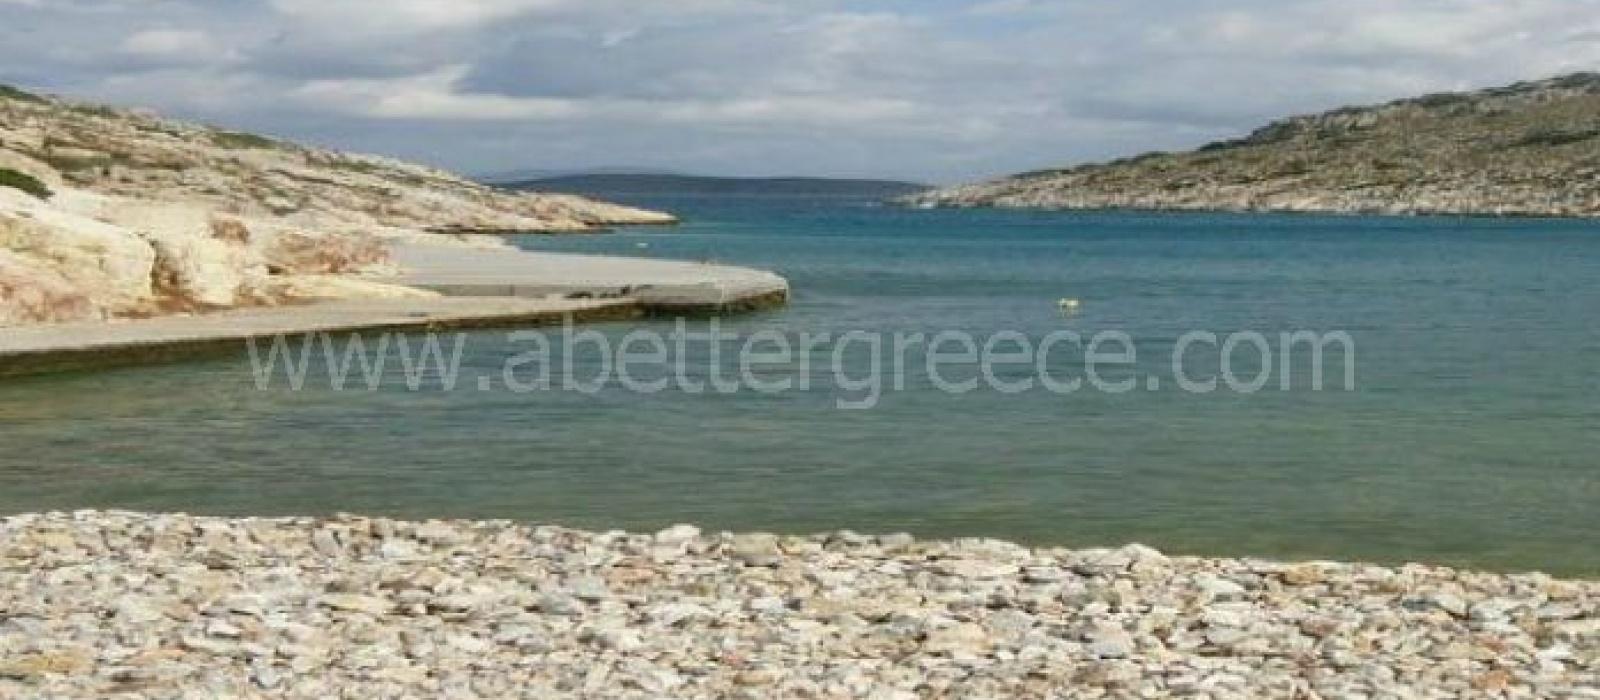 1 Bedrooms, Apartment, Vacation Rental, 1 Bathrooms, Listing ID 1163, Iraklia, Greece,